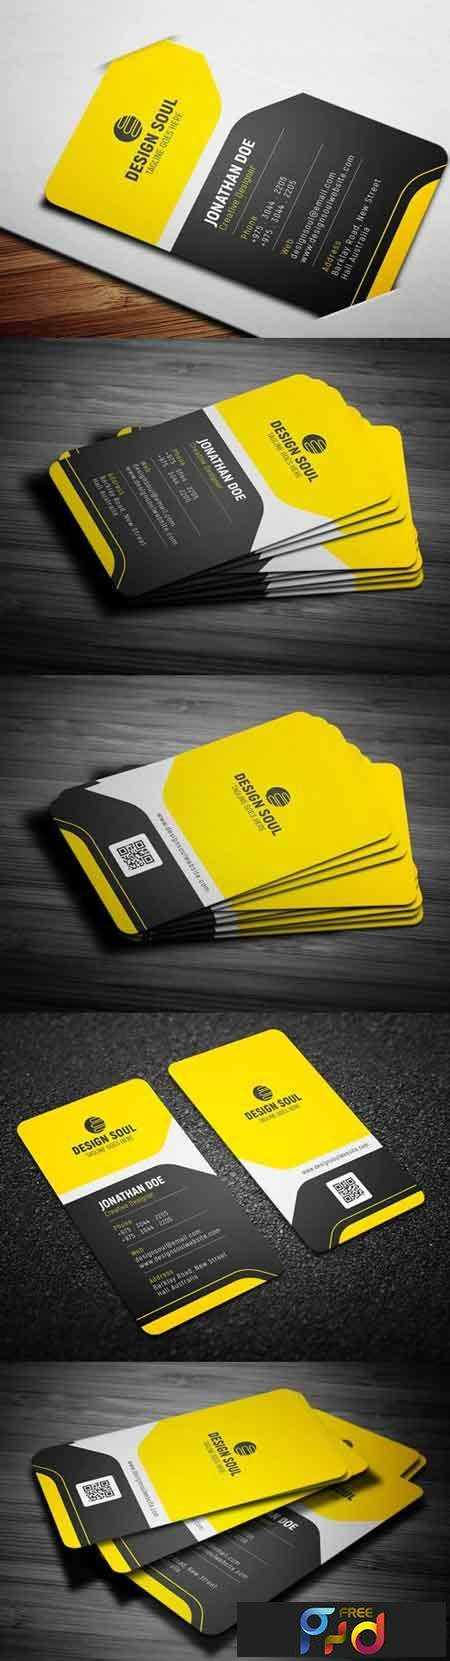 Google drive business card template business card for Google drive business card template